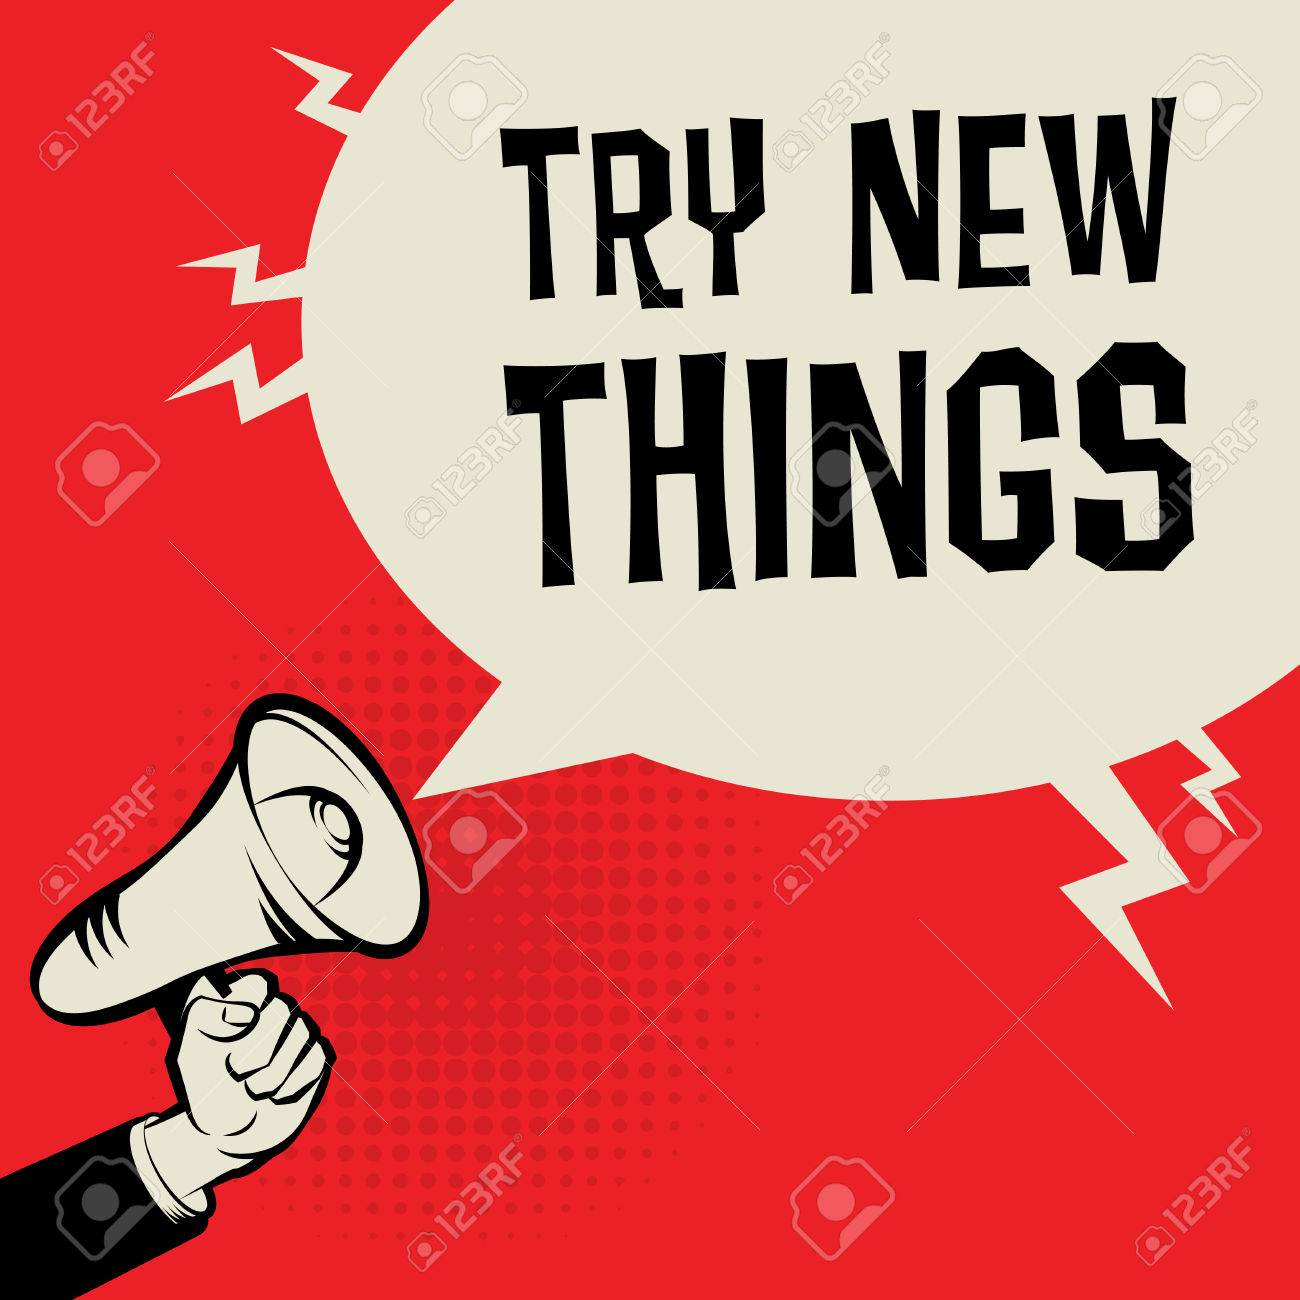 Try New Stuff Free